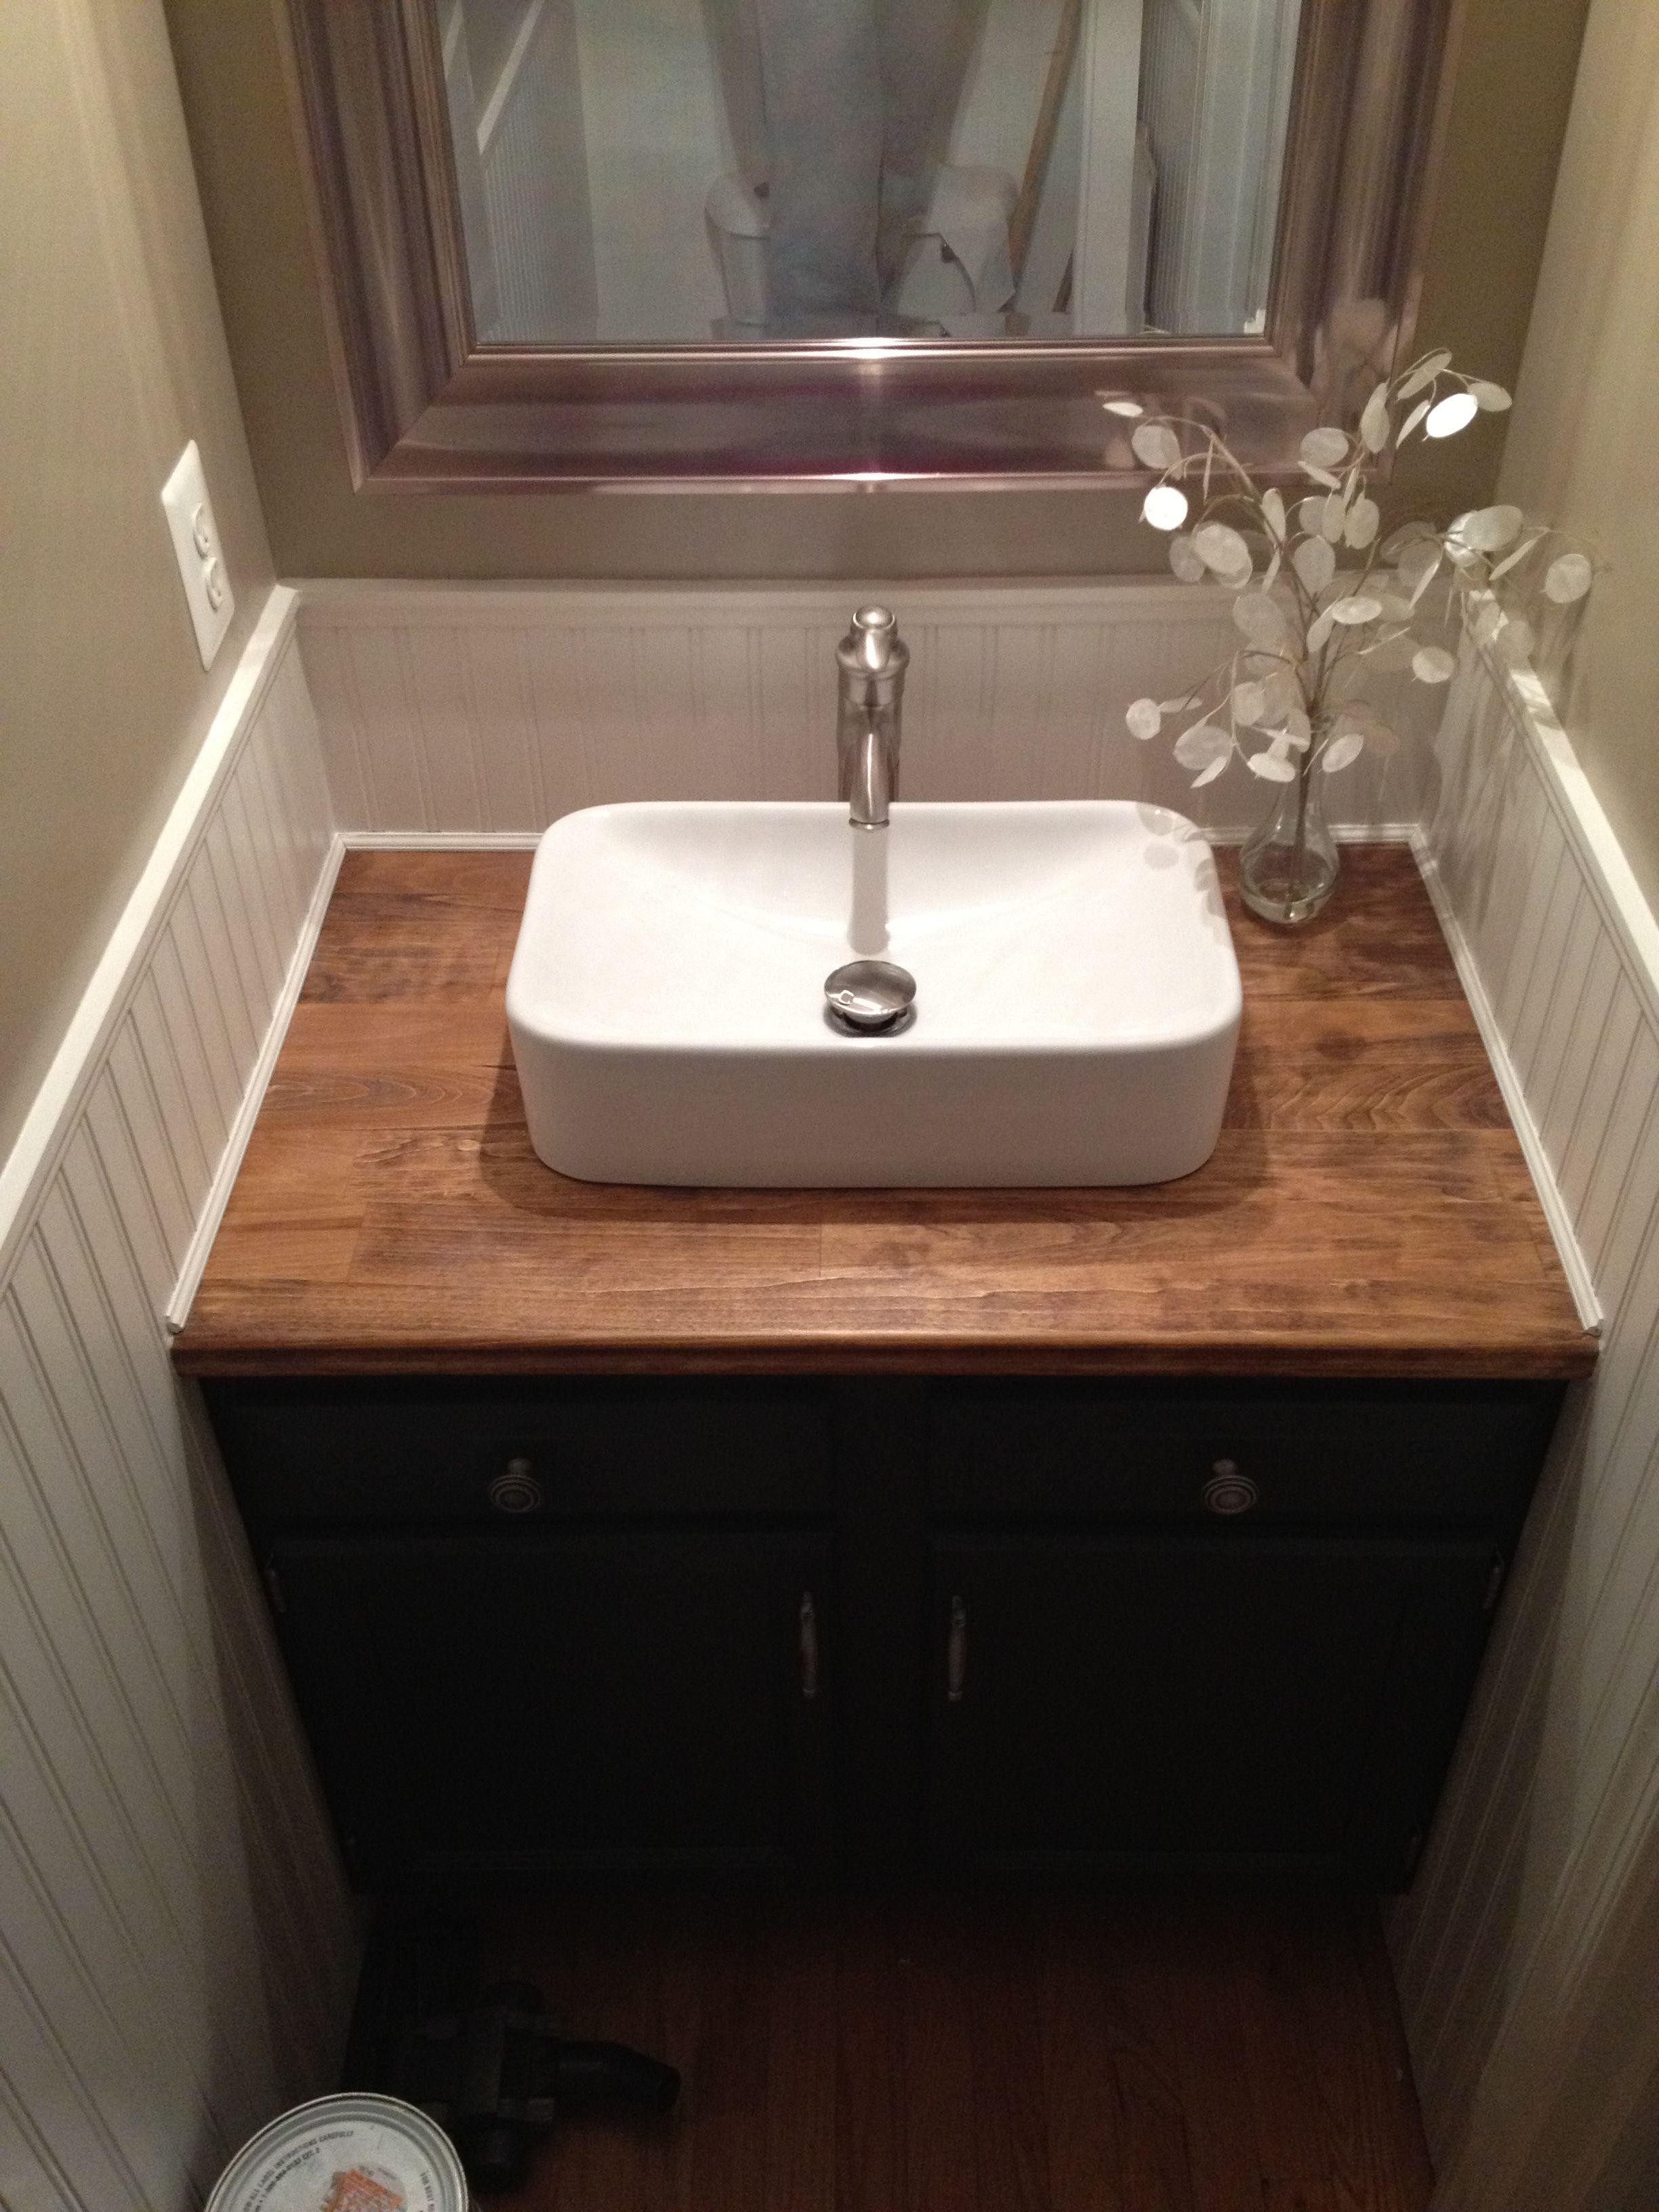 Butcher Block Vanity Top With White Vessel Sink Bathroom Sink